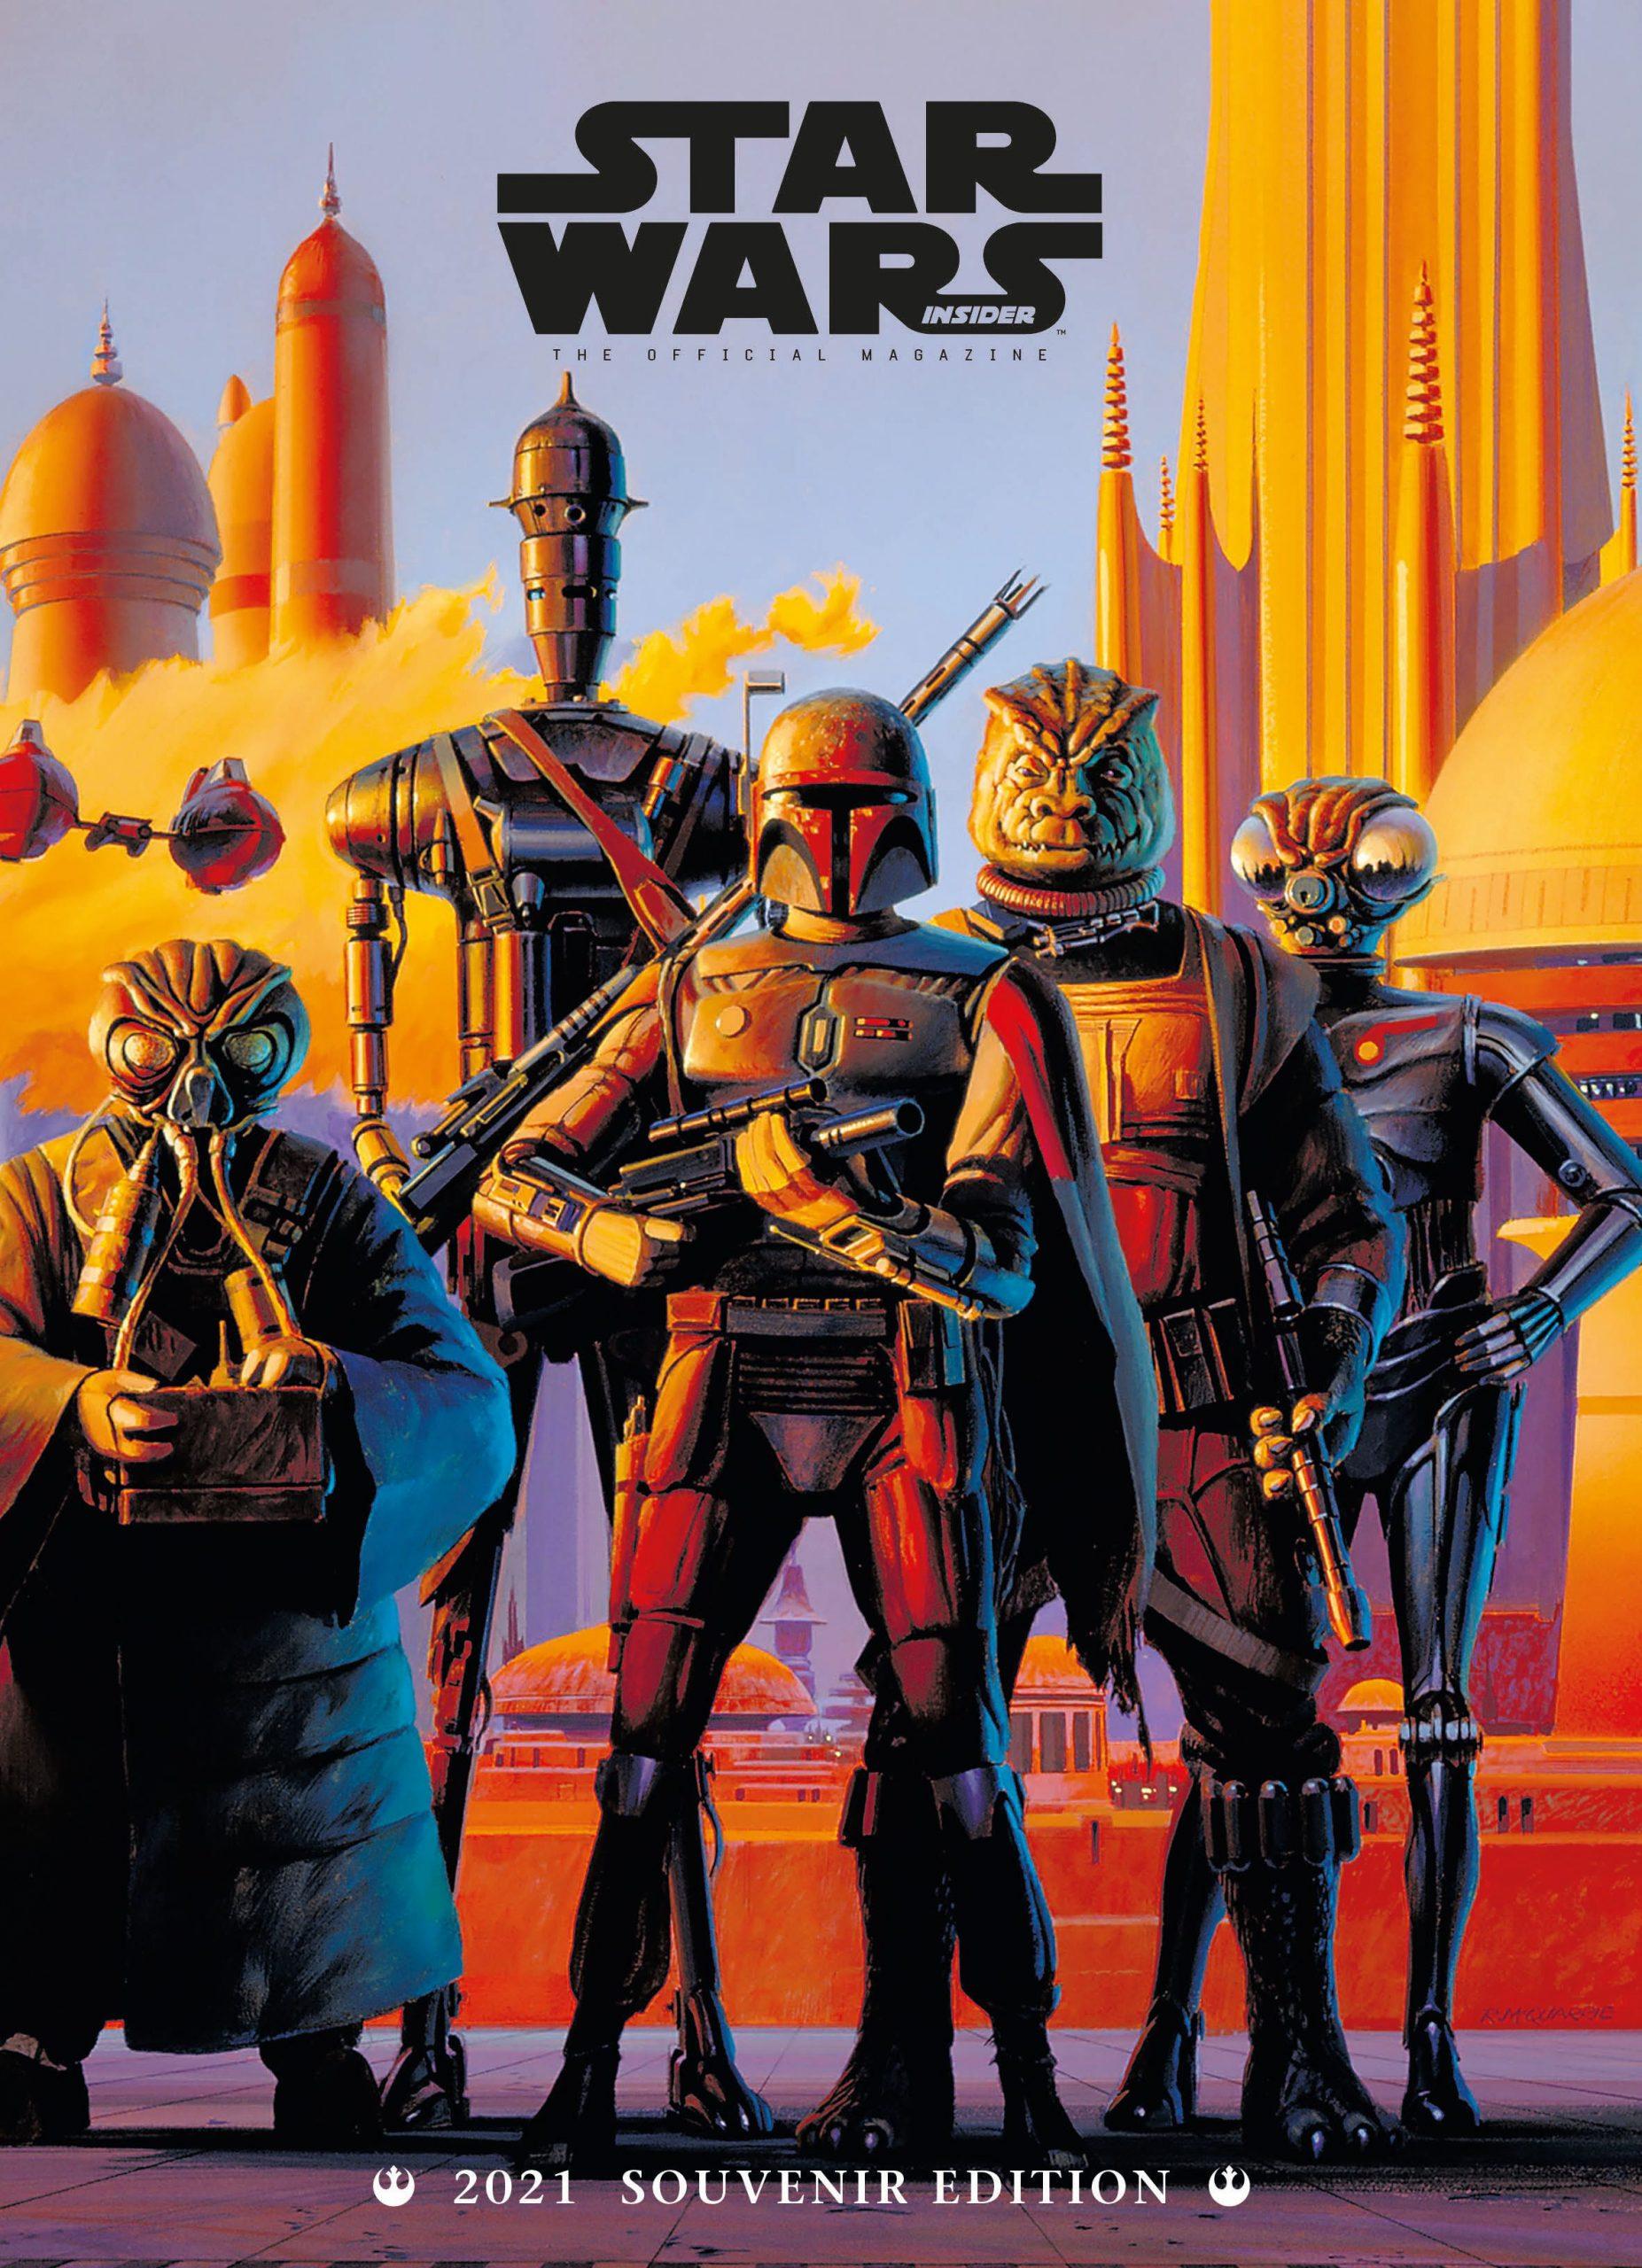 Star Wars Insider Subscriber Cover Bounty Hunters